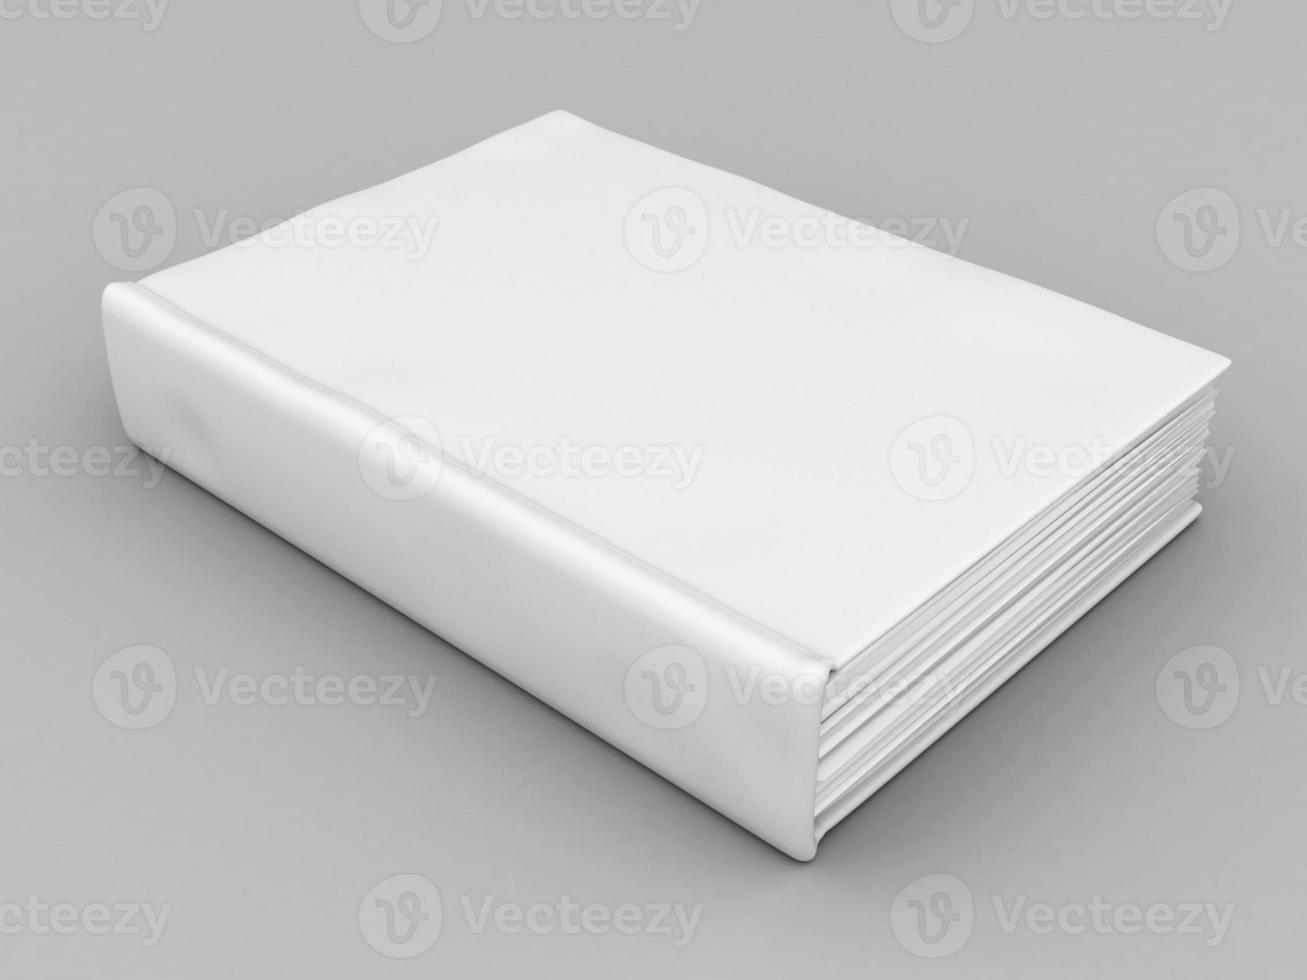 Books bindings and Literature photo